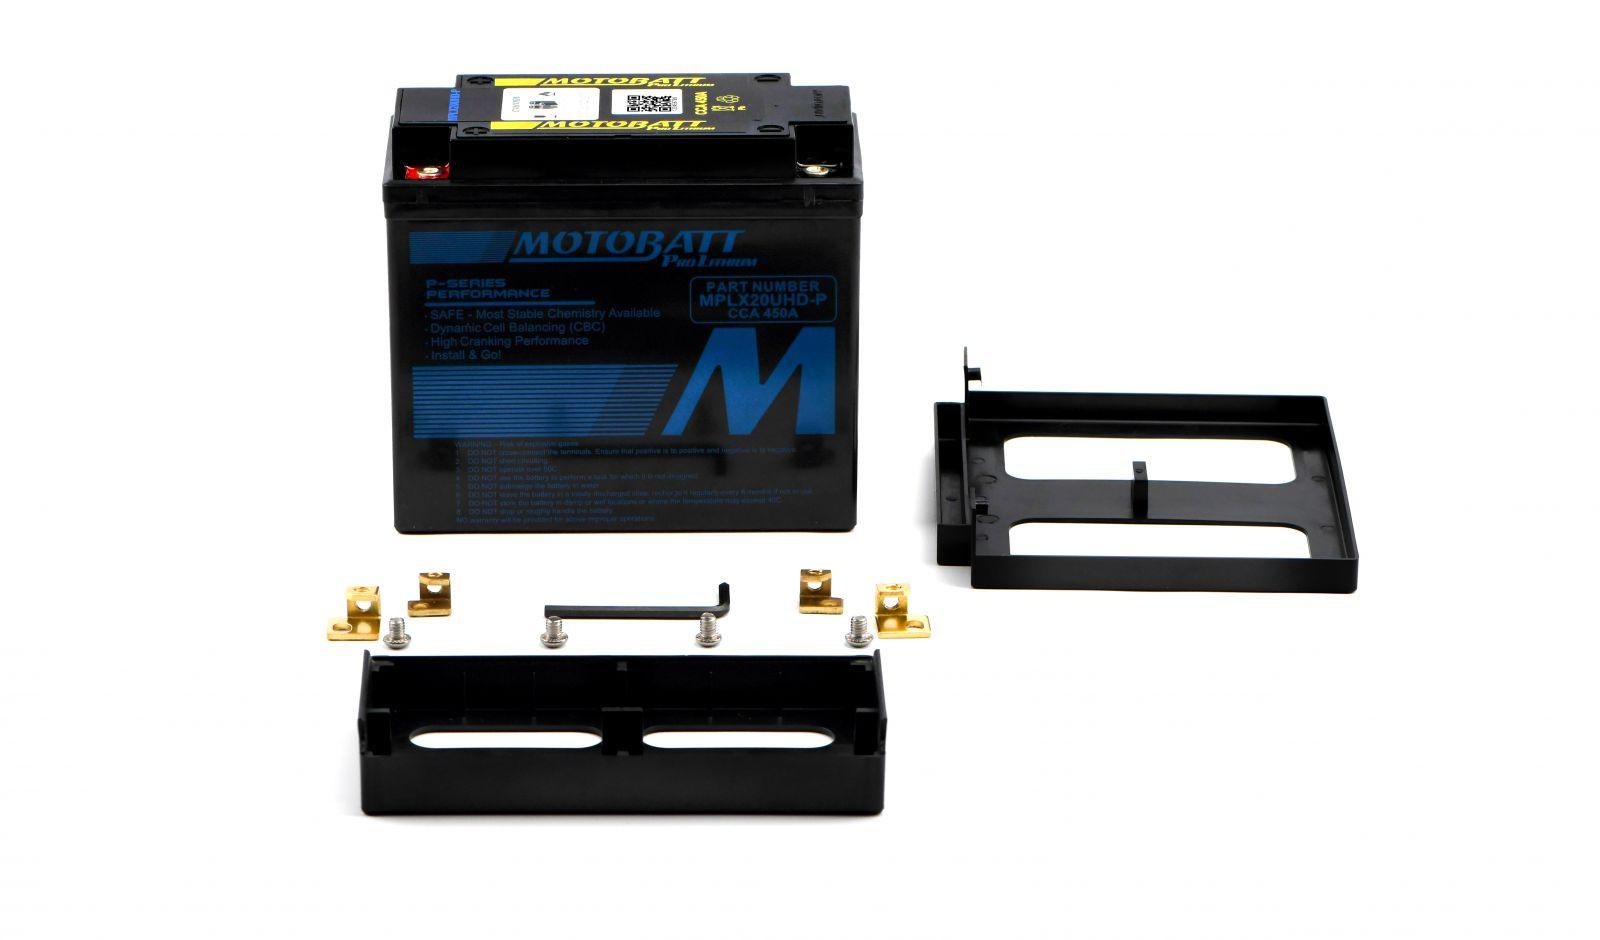 motobatt lithium batteries - 501205ML image